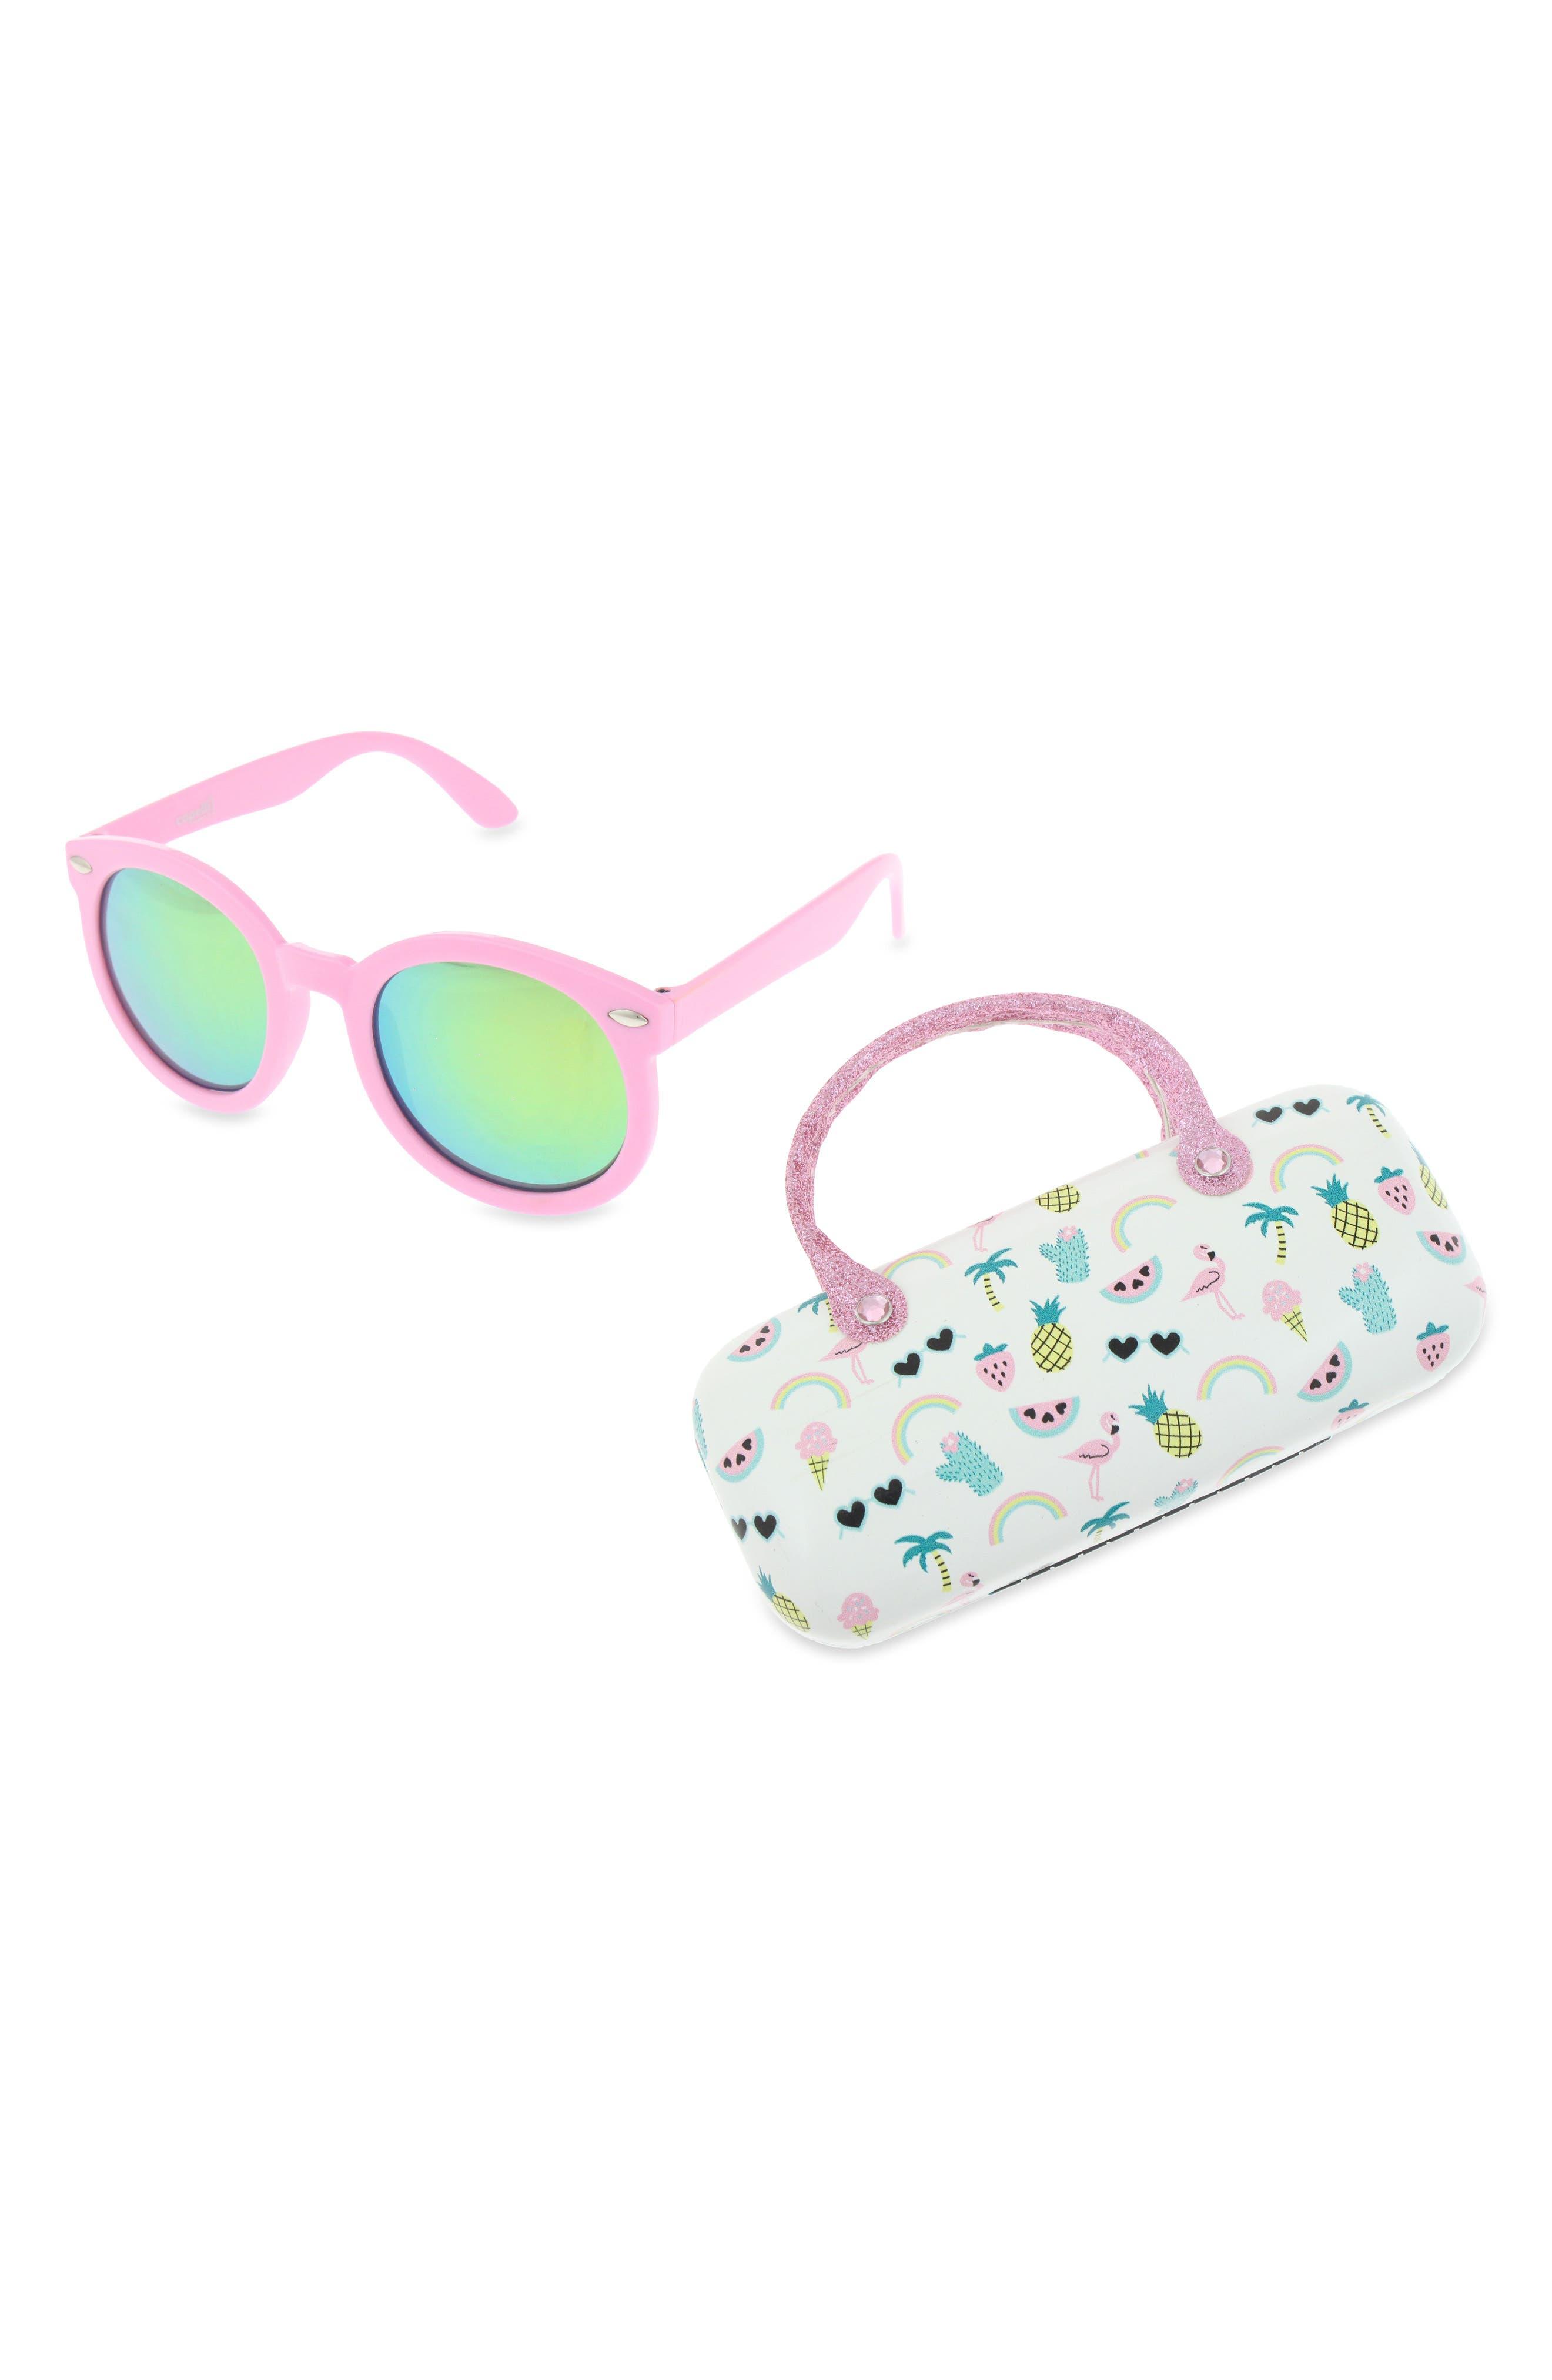 Summer Fun 60mm Sunglasses & Case Set,                             Main thumbnail 1, color,                             Multi Combo